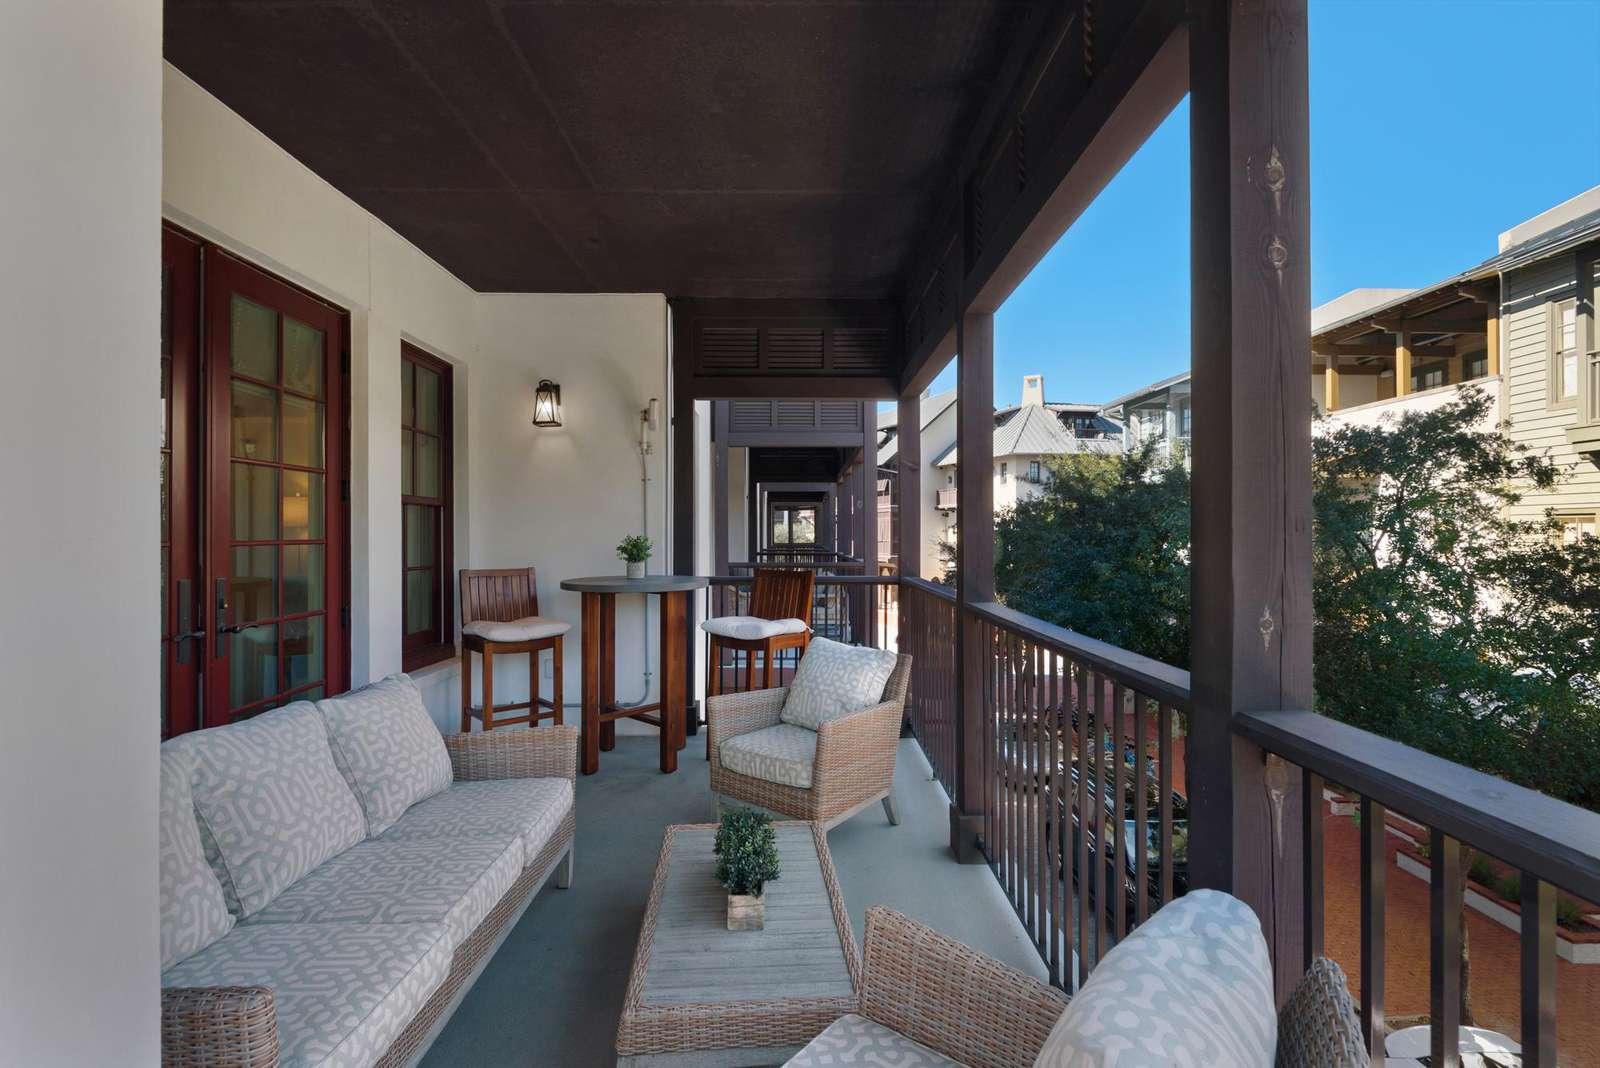 Balcony off dining area